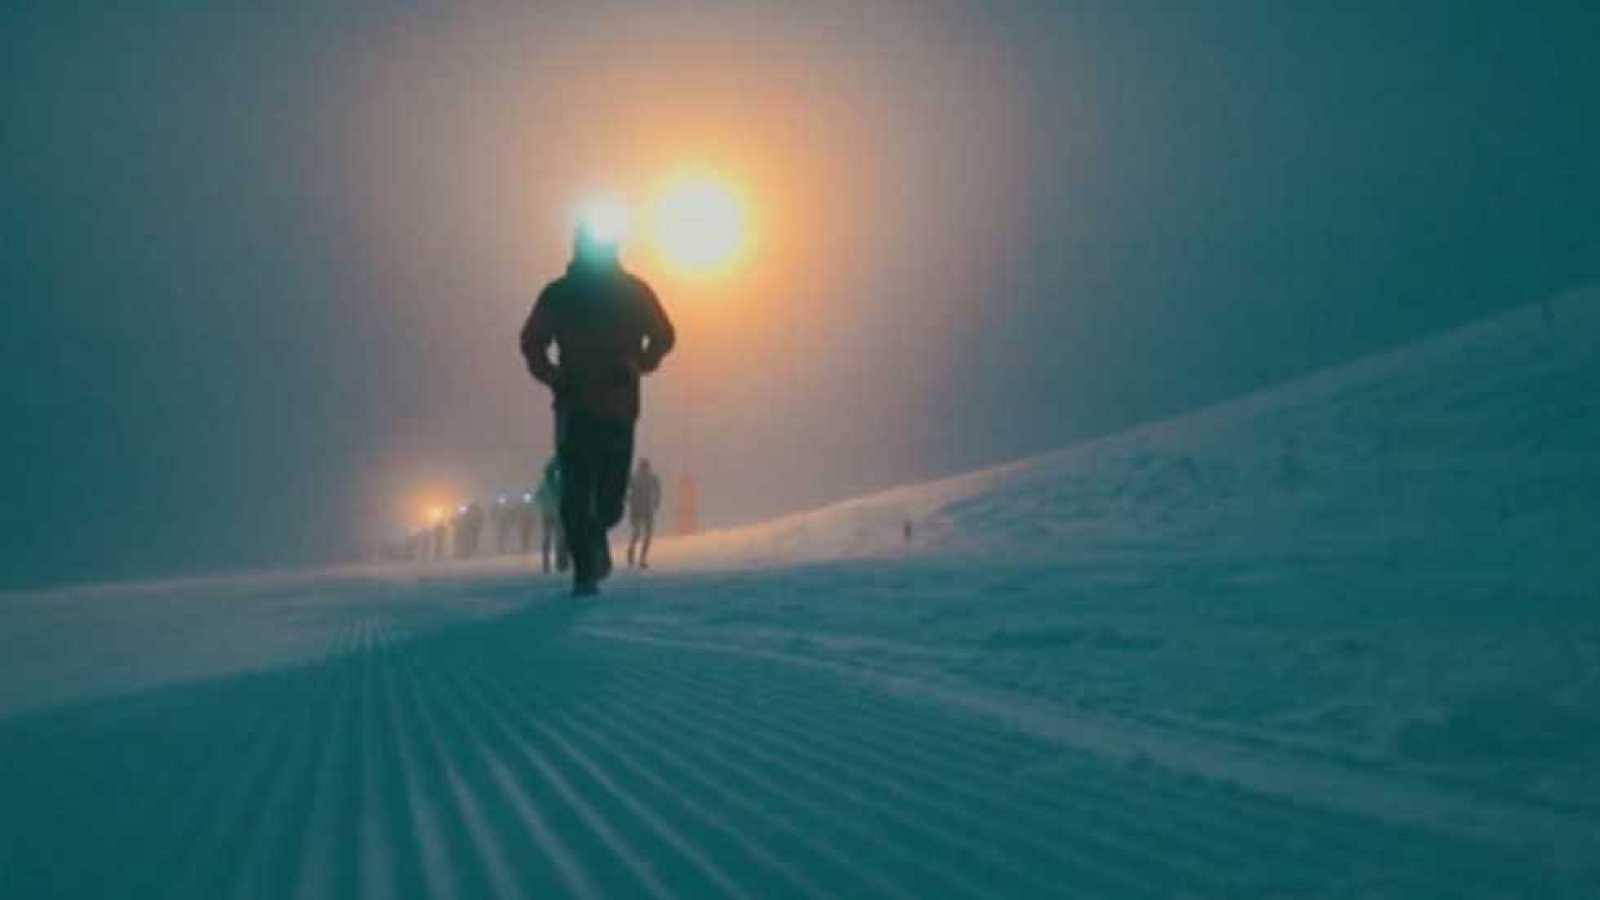 46ba553101e76 Para todos los públicos Snow Running 2017 - Campeonato de España - ver  ahora reproducir video